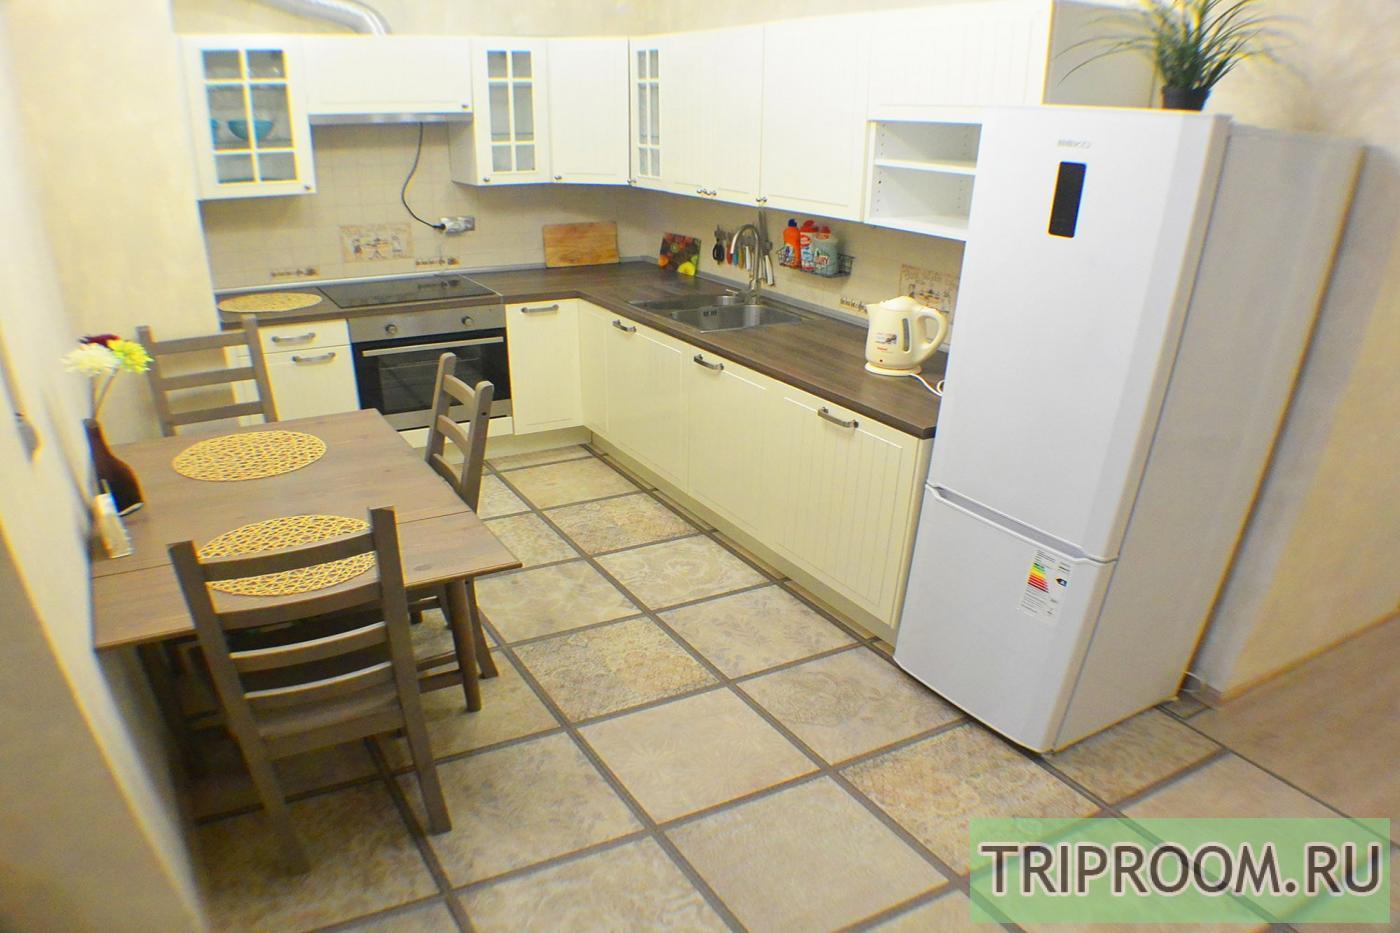 1-комнатная квартира посуточно (вариант № 26990), ул. Кирпичная улица, фото № 14